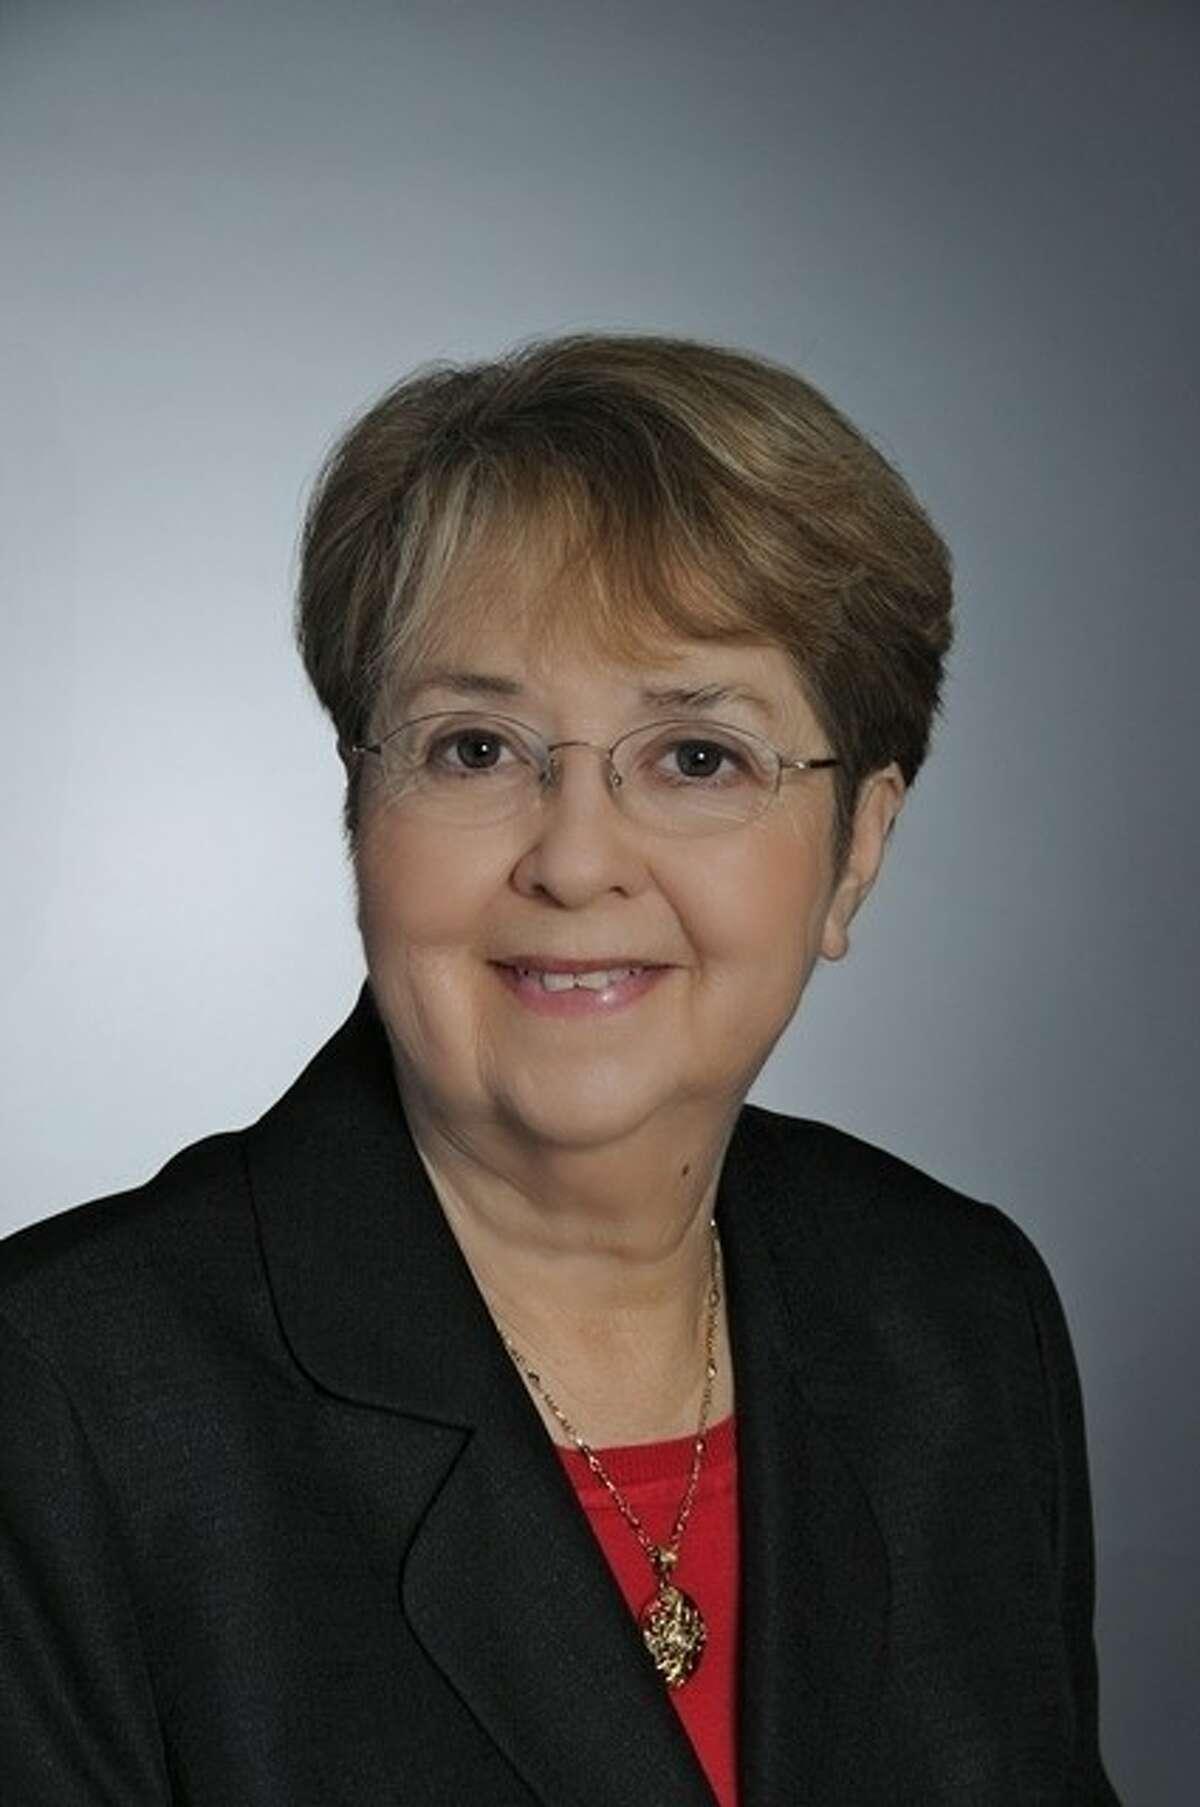 Herlinda Garcia was sworn in as the new Houston Community College trustee fro District III on Jan. 17.